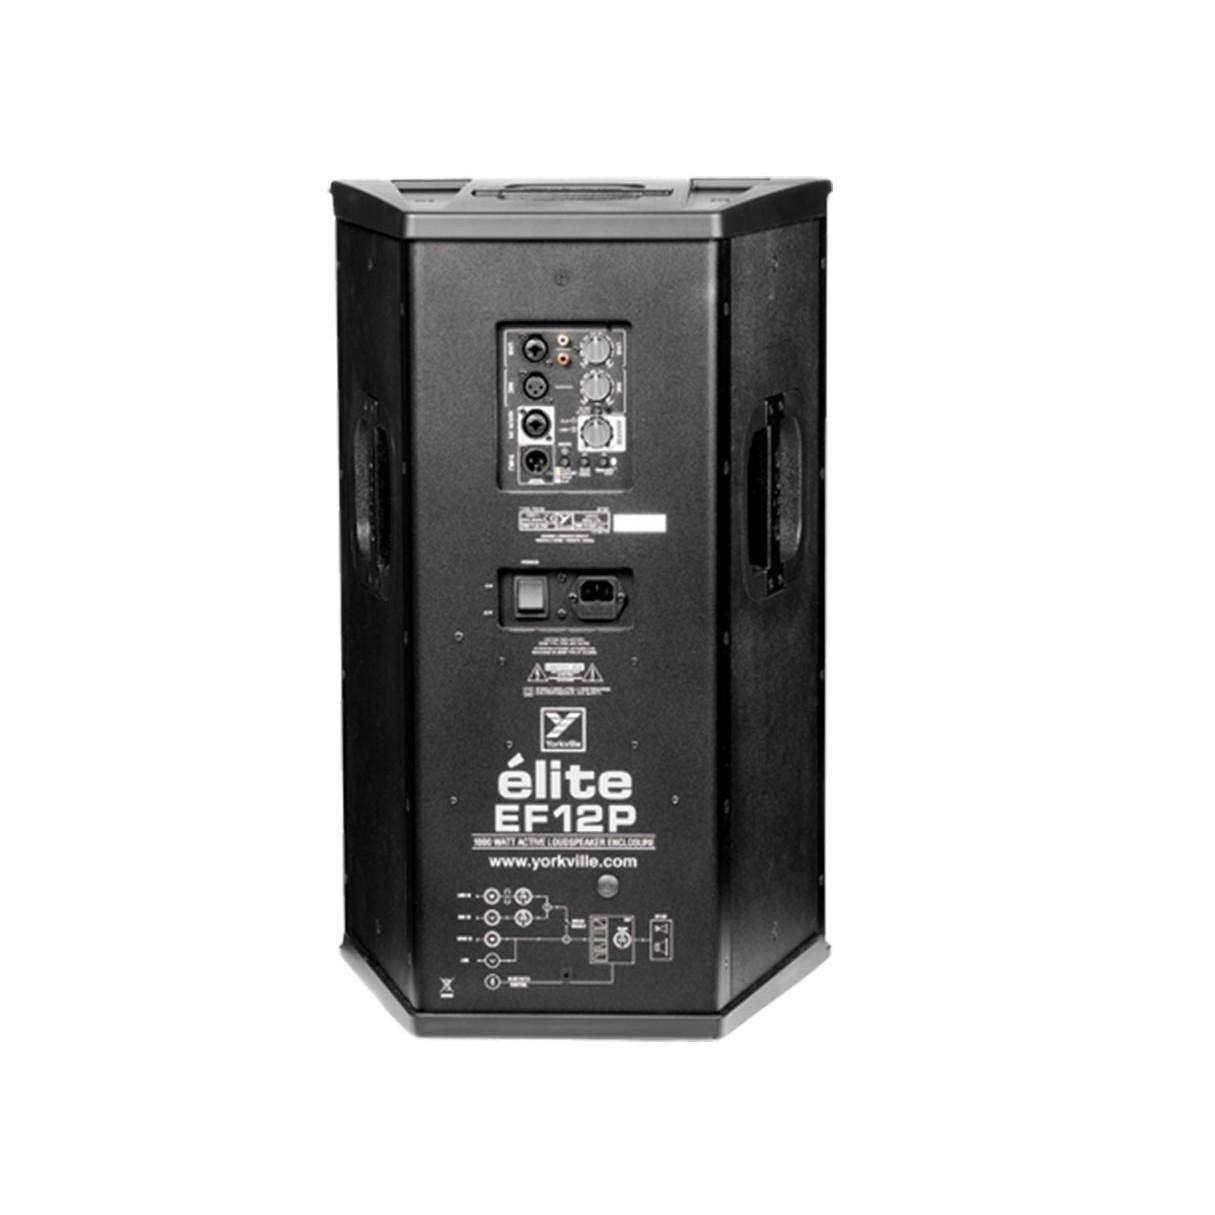 yorkville ef12p elite 12 1200 watt active loudspeaker. Black Bedroom Furniture Sets. Home Design Ideas